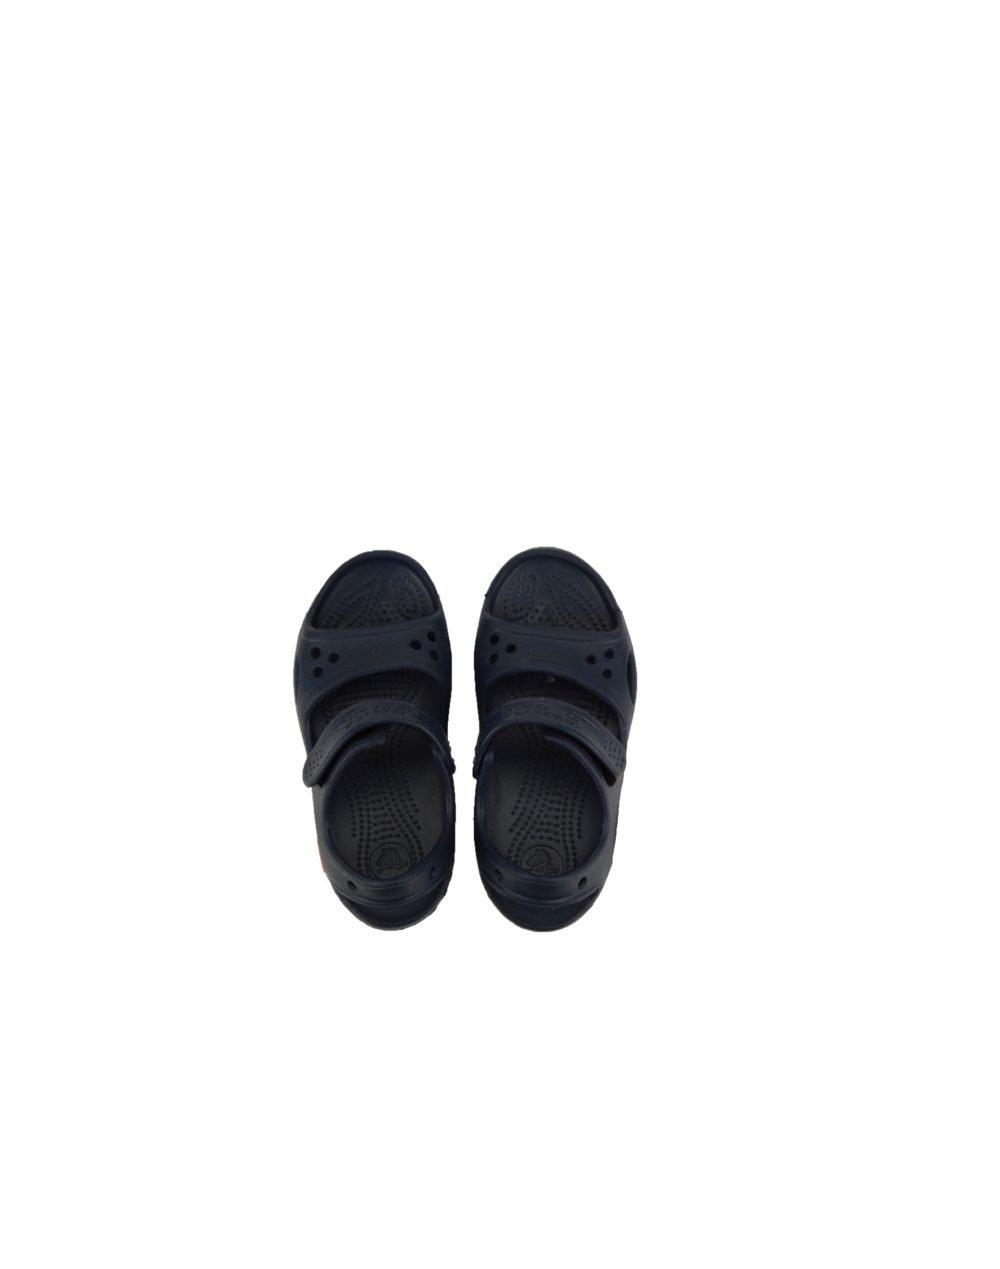 Crocs Crocband II Sandal Kids (14854-462) Navy/White